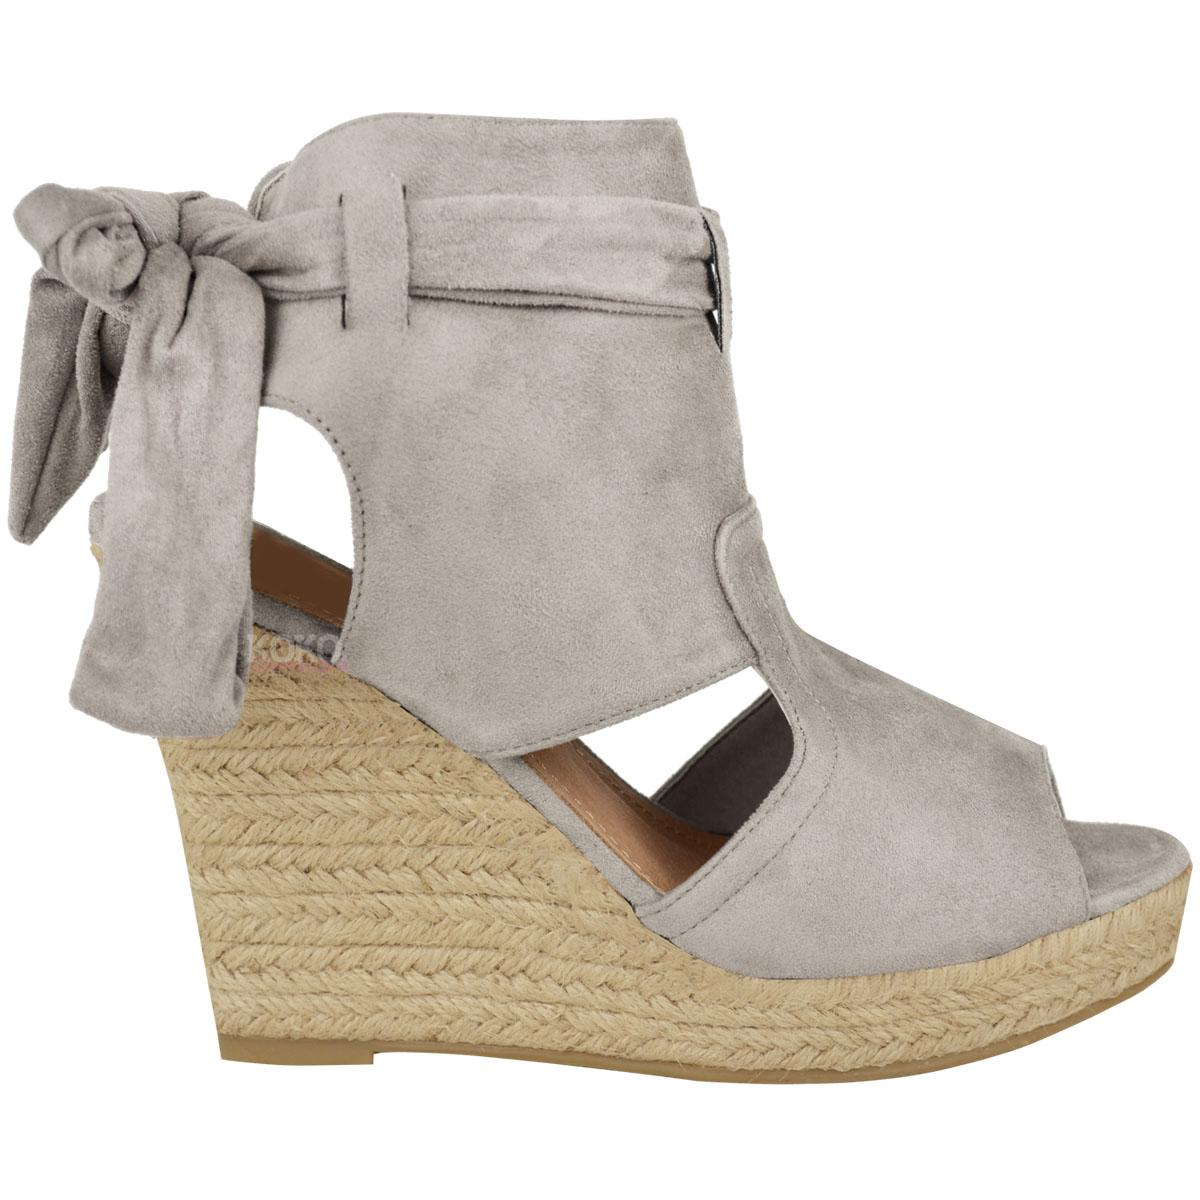 womens summer sandals high heels peep toe wedges